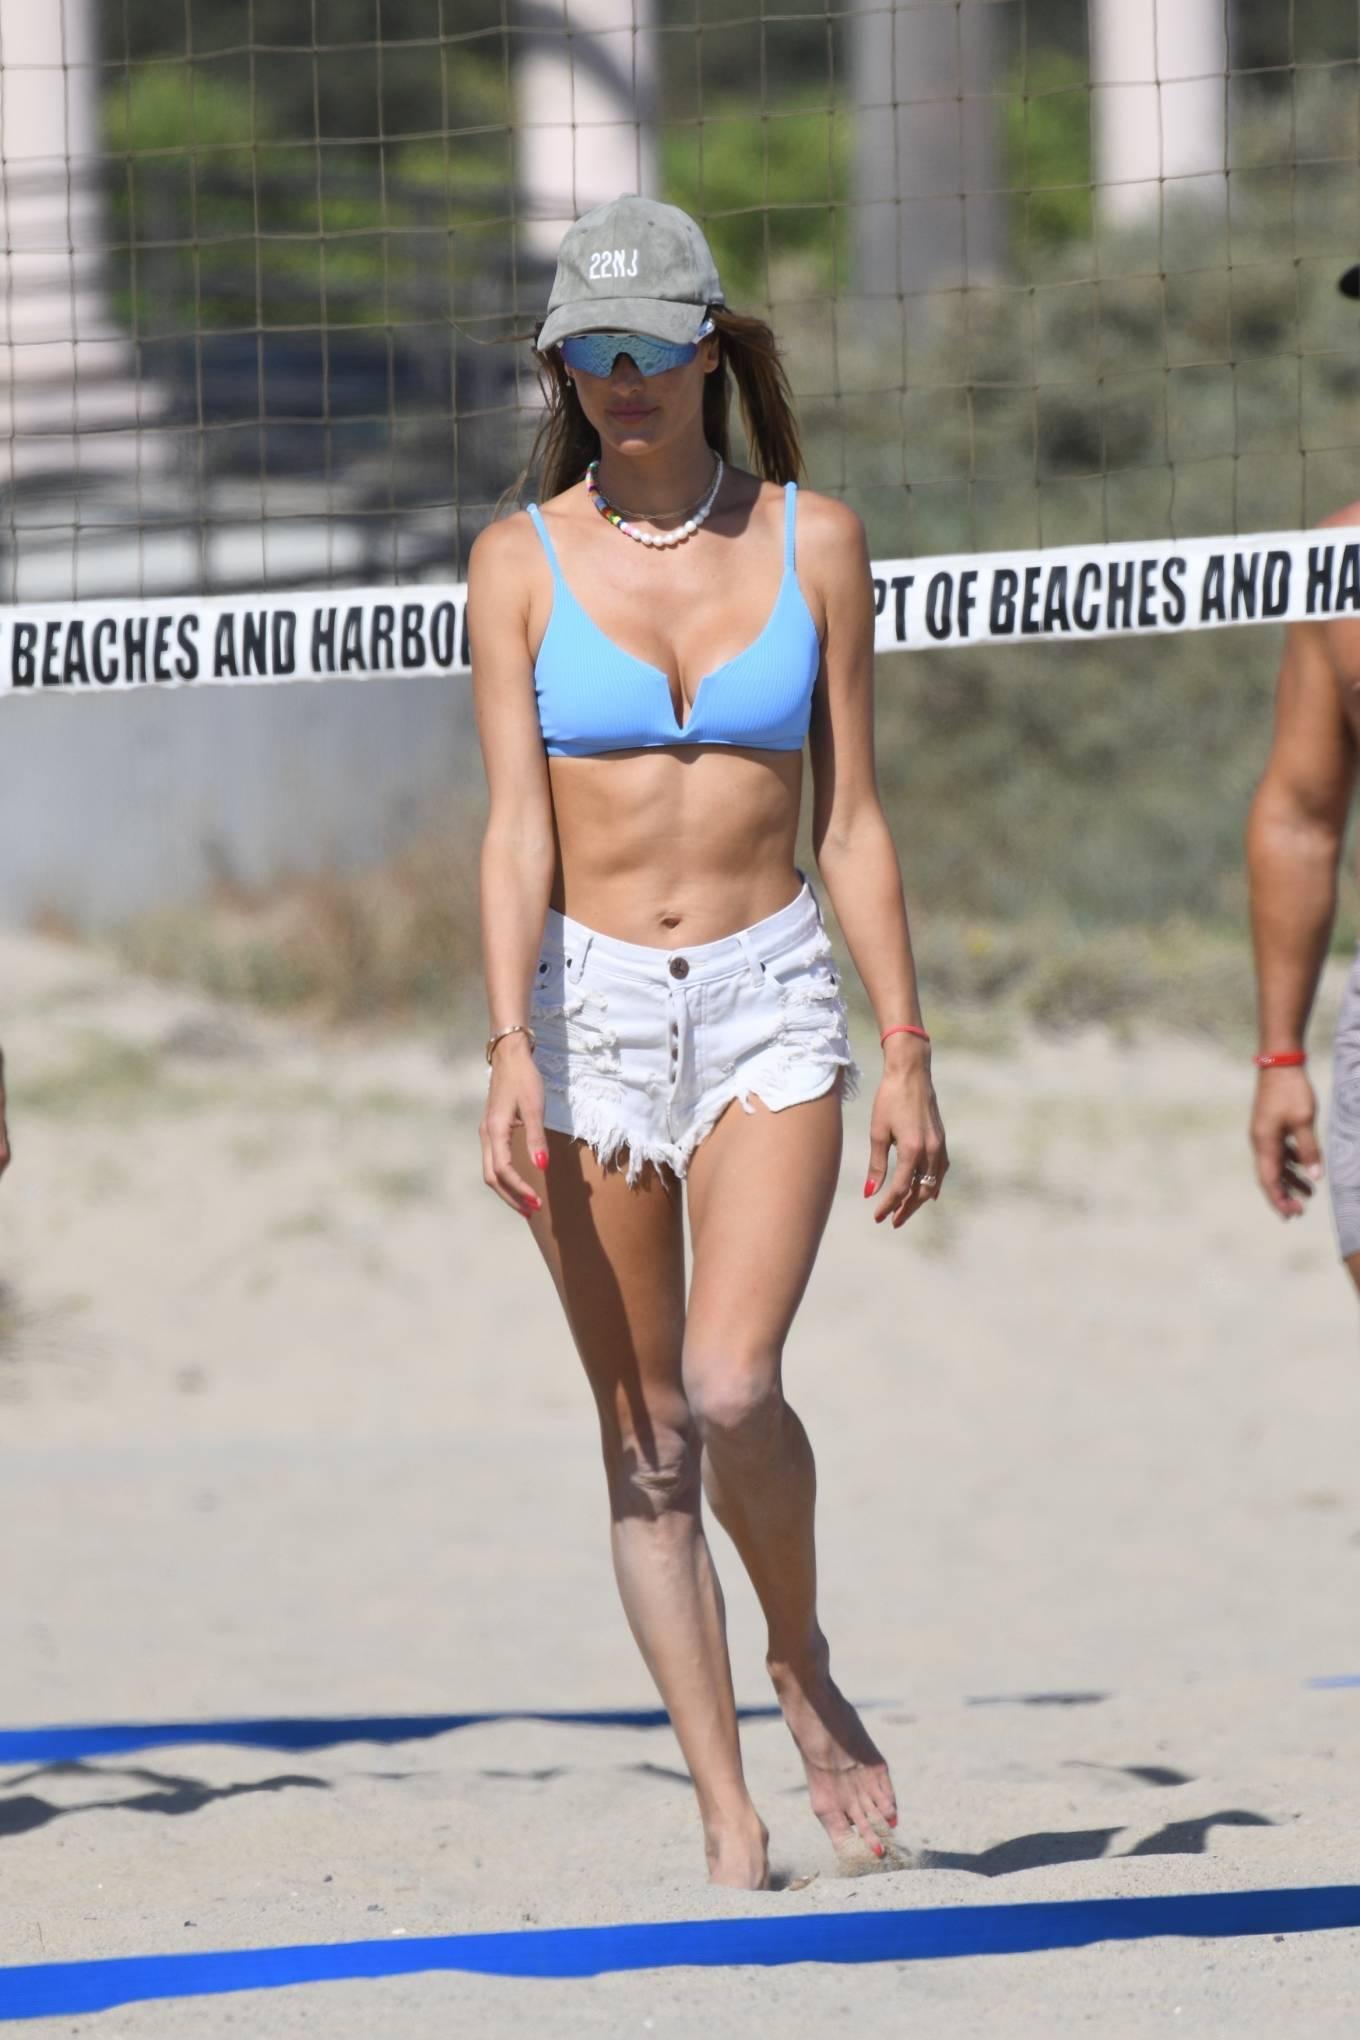 Alessandra Ambrosio donning a skimpy blue bikini top with a scoop neck and spaghetti straps